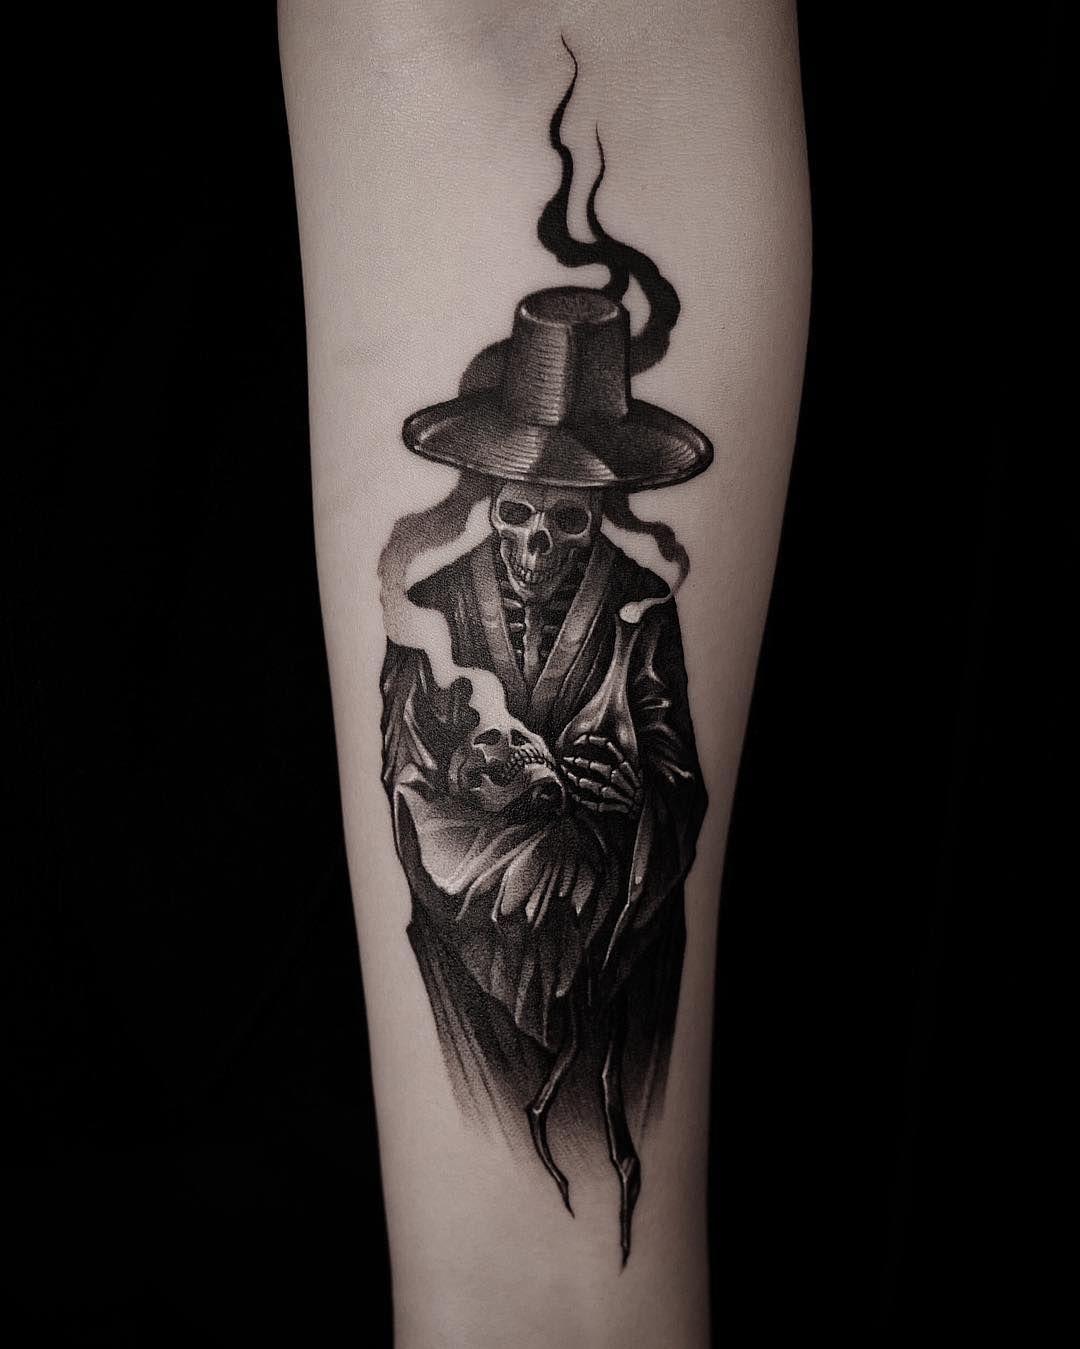 Tattoos About Death : tattoos, about, death, Tattoo, Ideas, Death